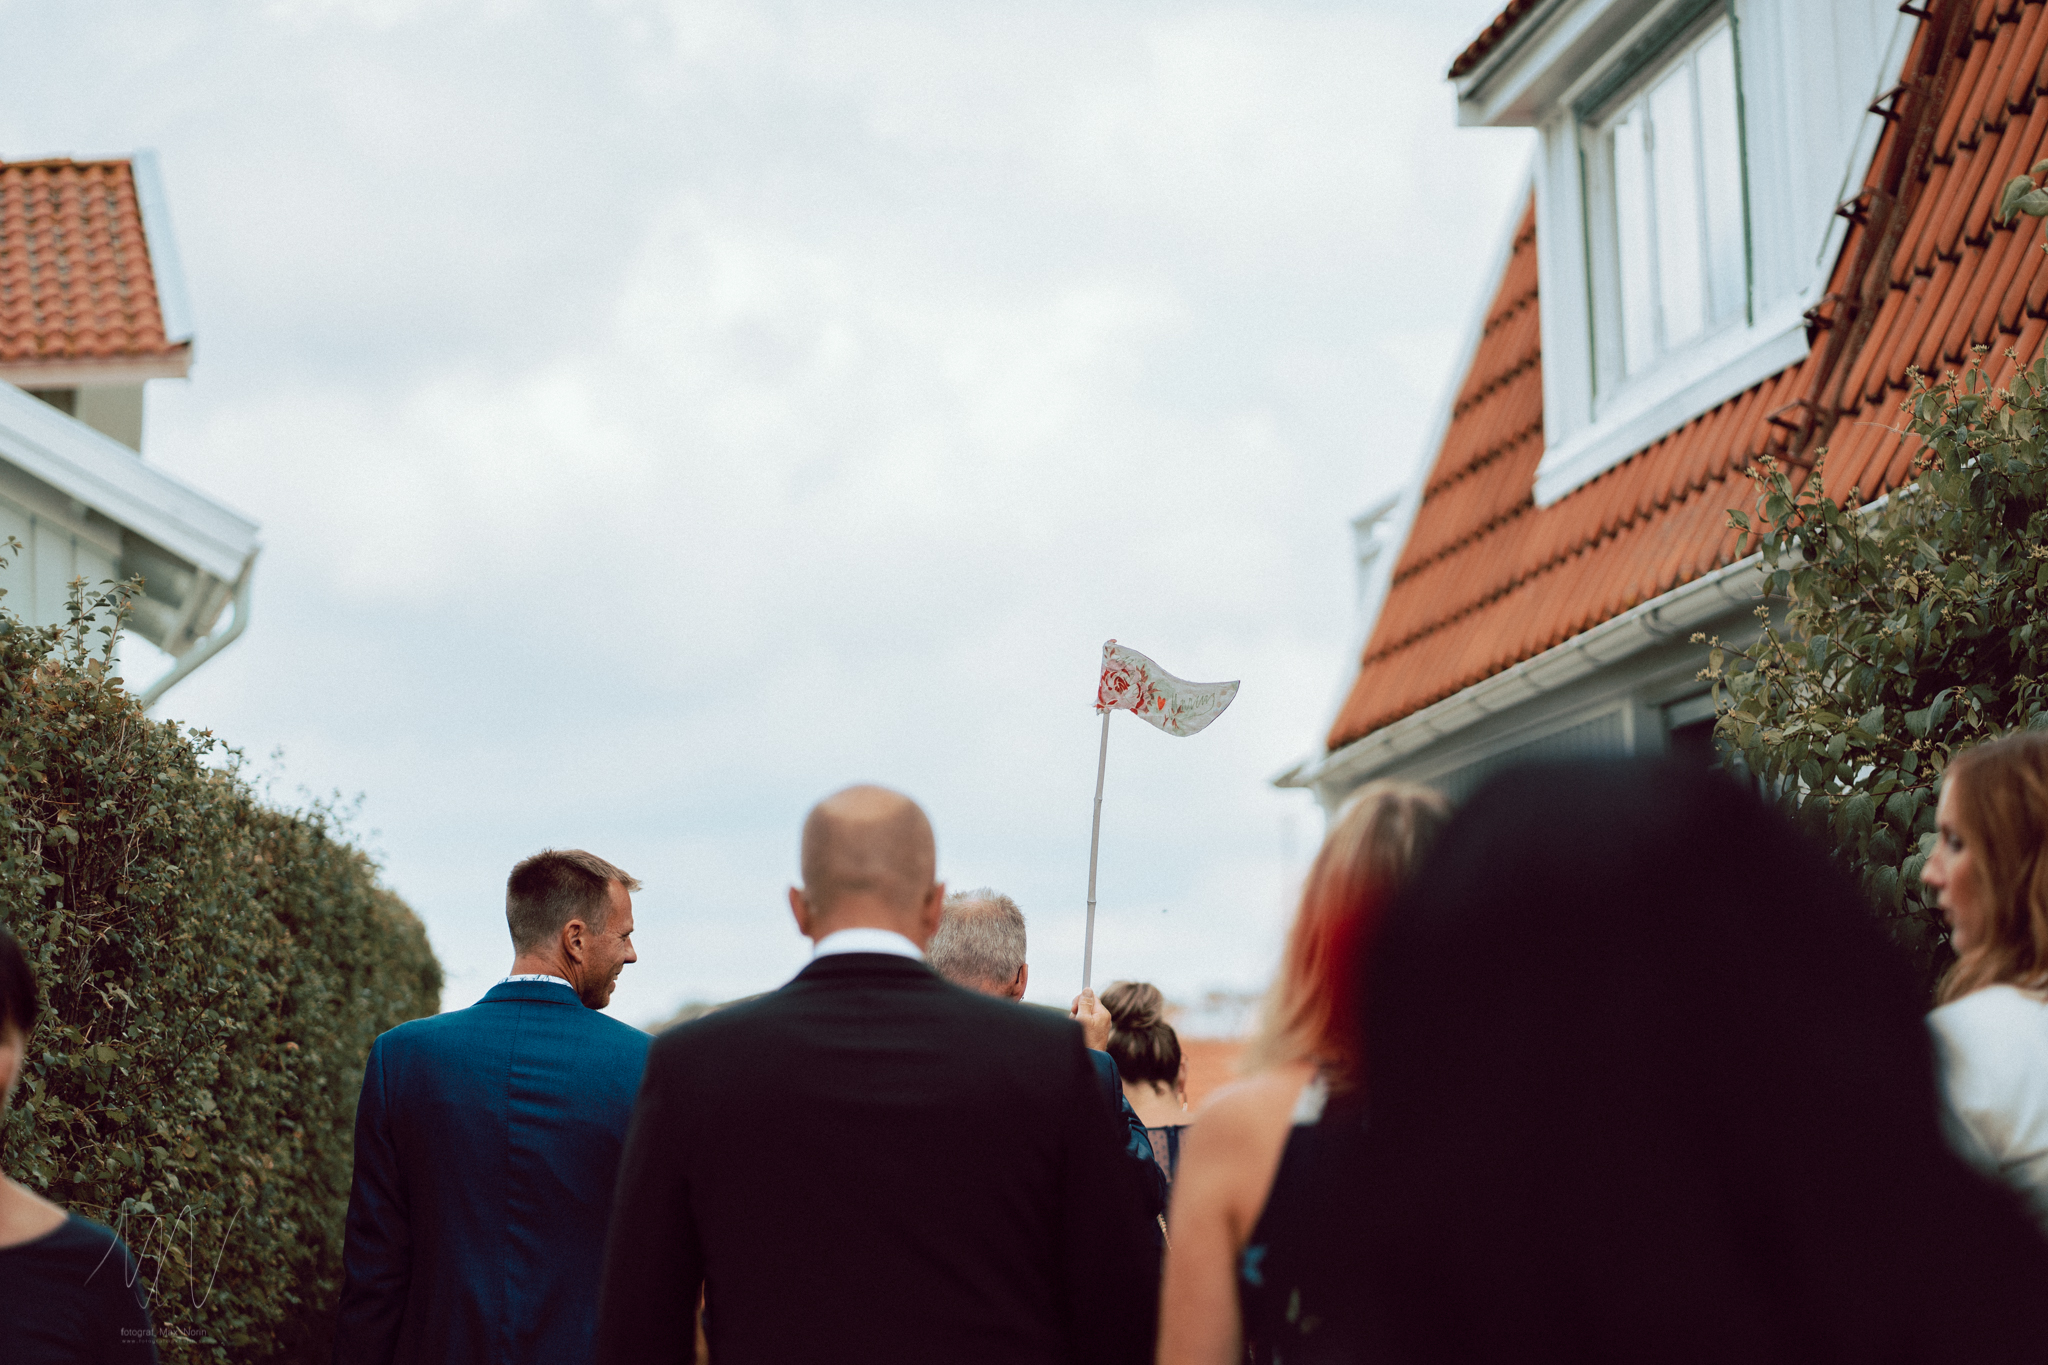 Bröllop-fotografmaxnorin.se-MariaMarcus-252.JPG